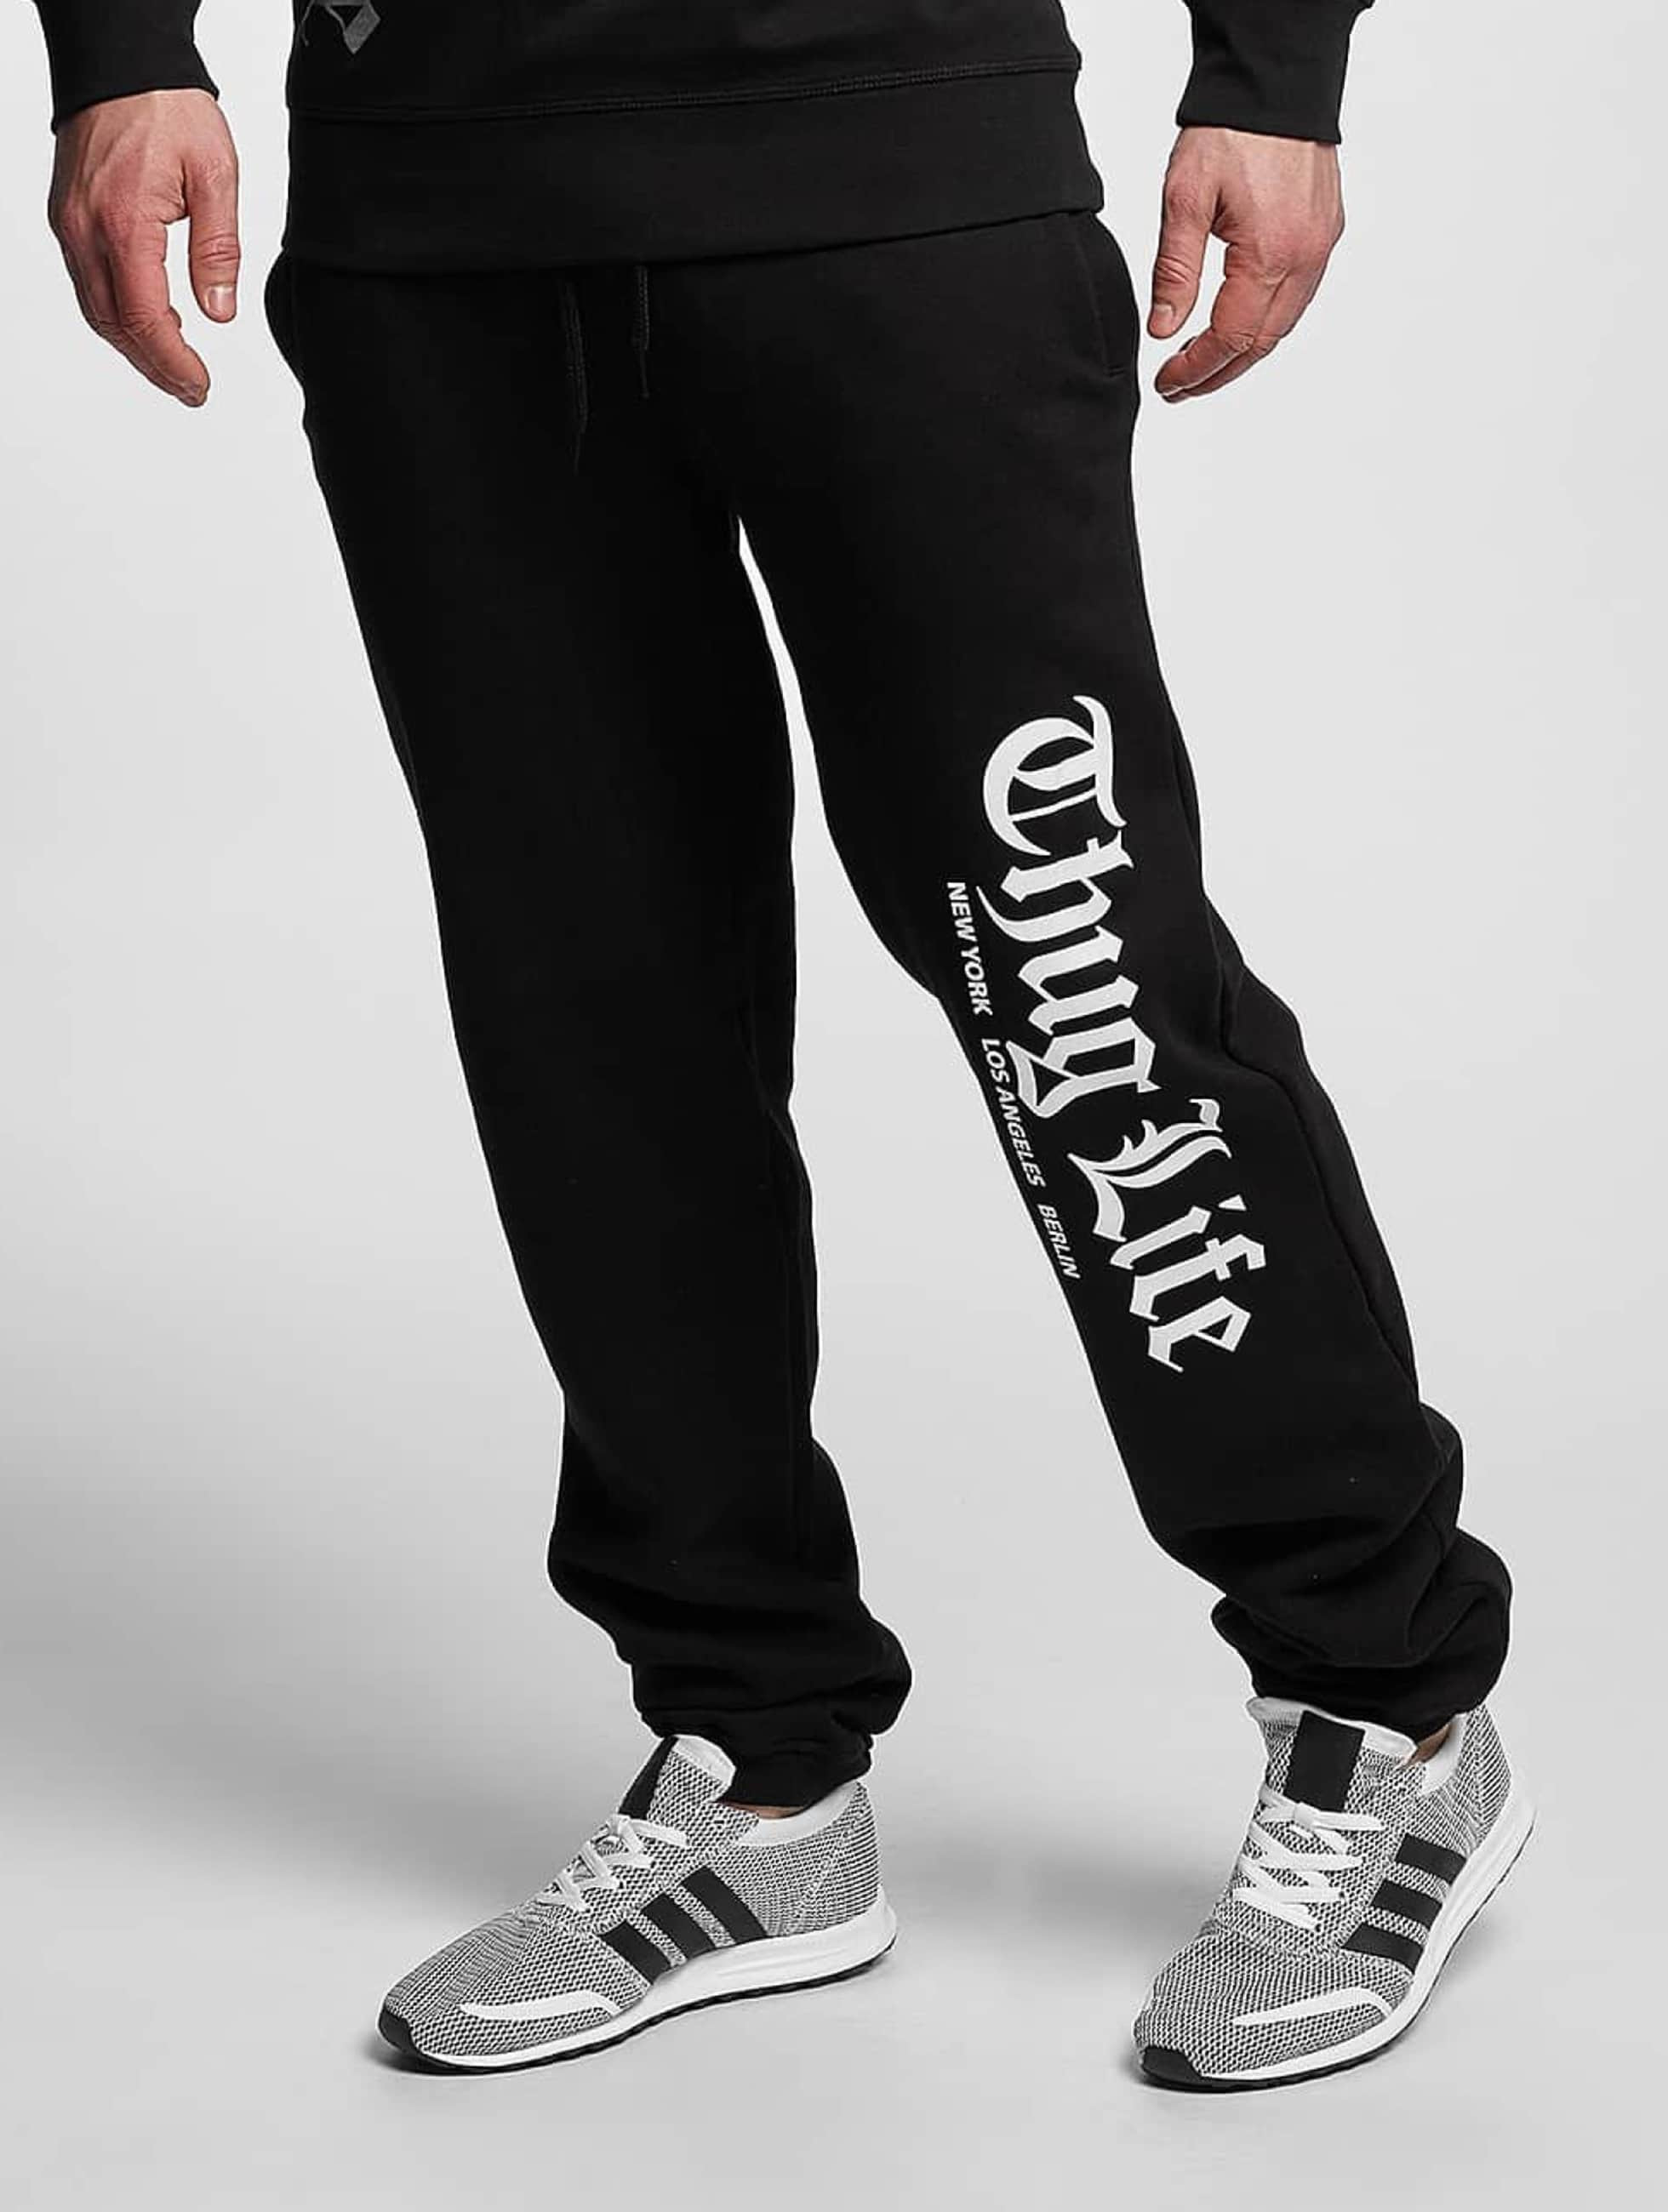 Thug Life Basic Männer Jogginghose Cities in schwarz